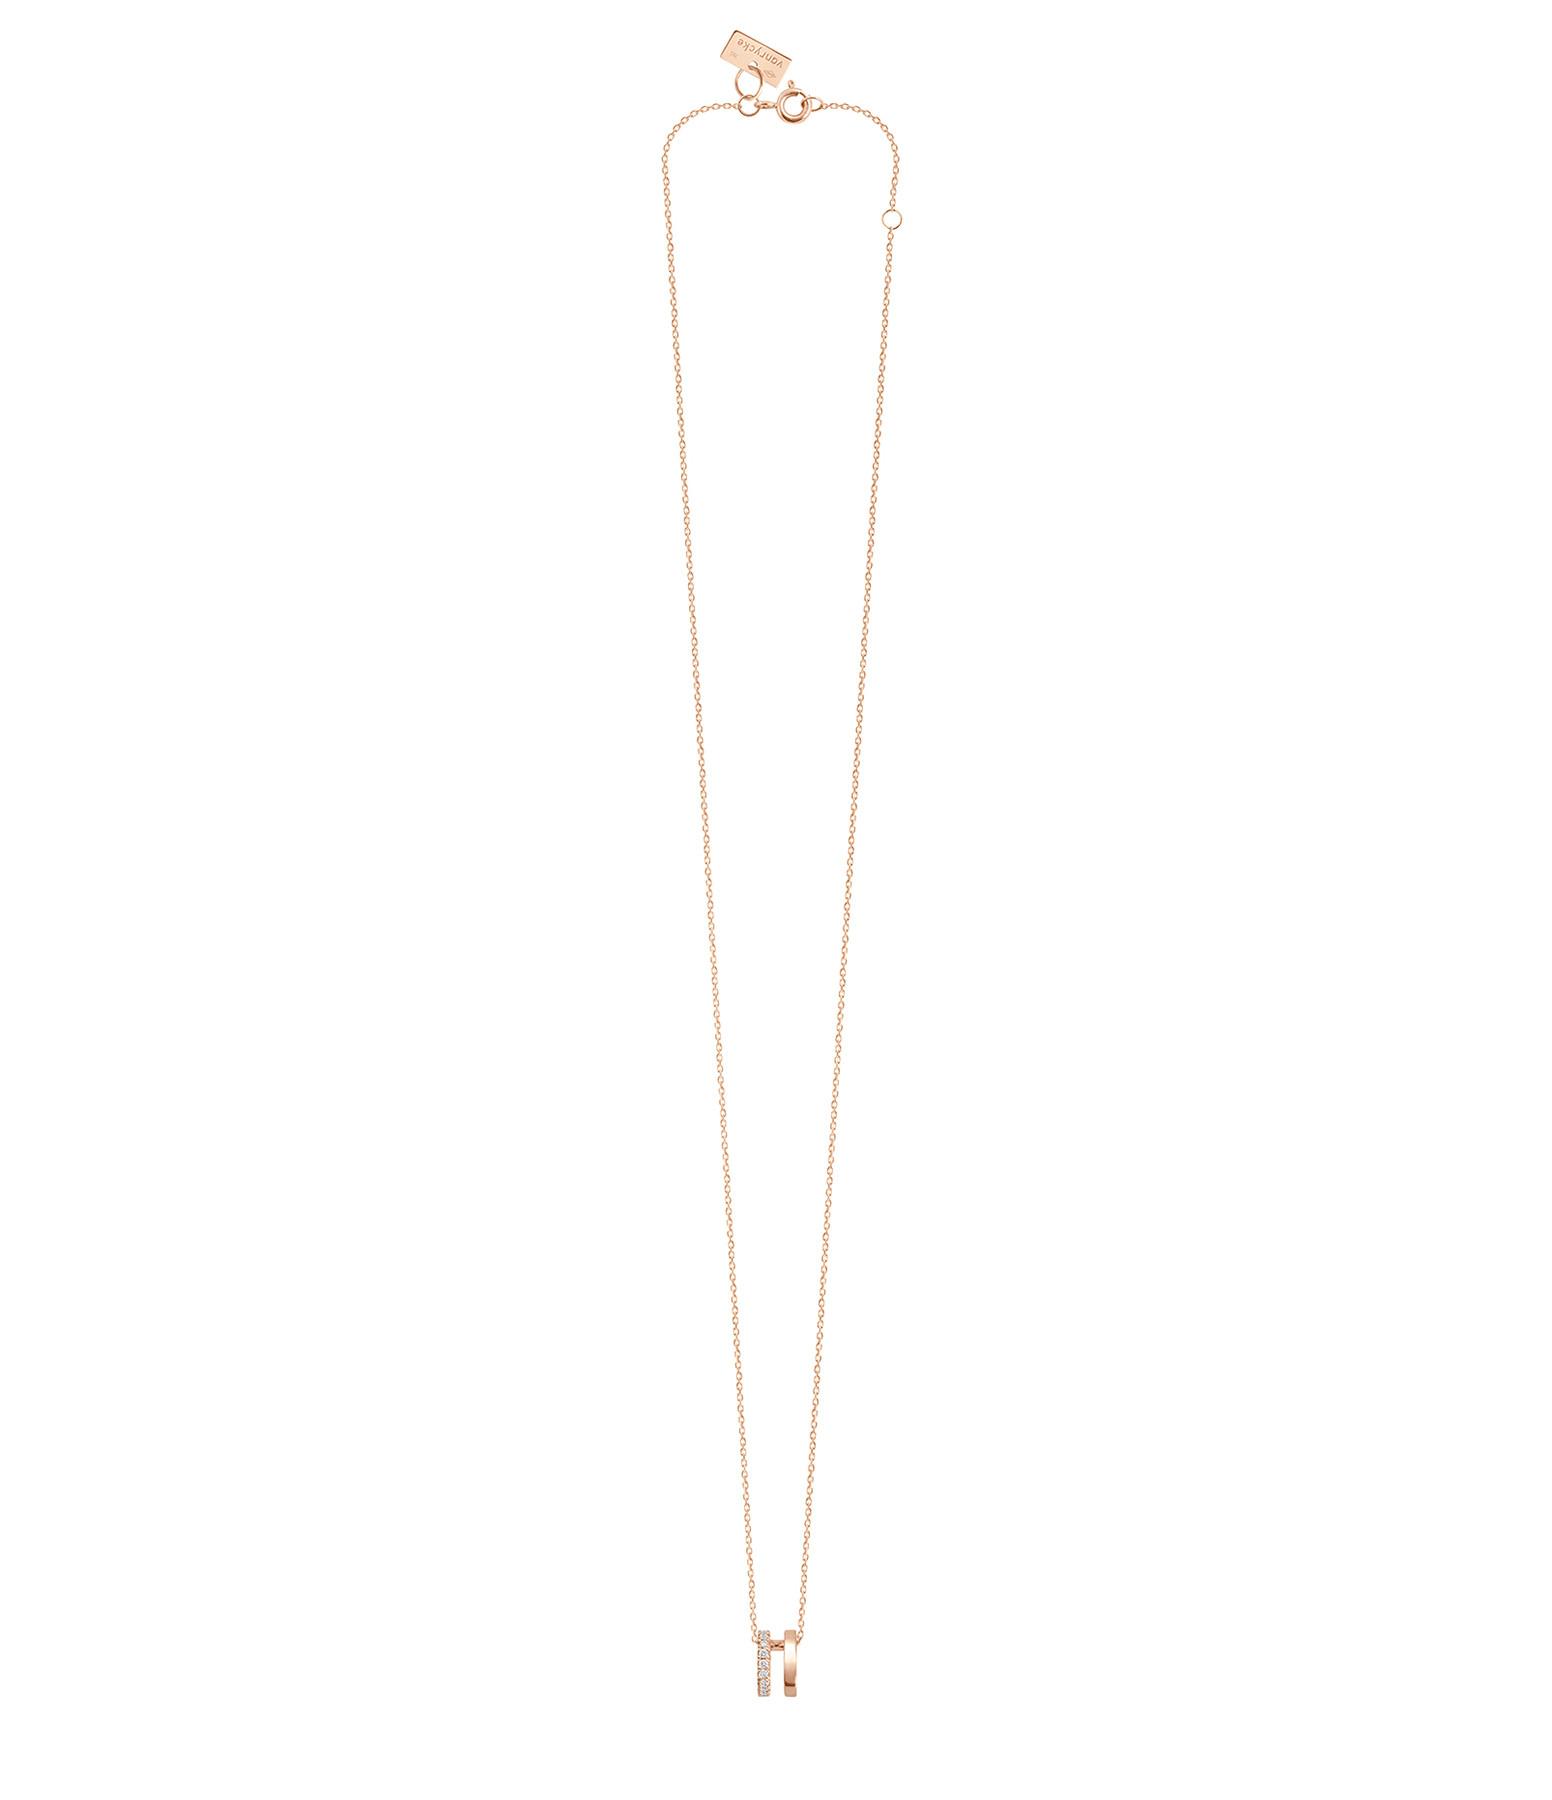 VANRYCKE - Collier Charlie Double Or Rose Rose Semi-Pavée Diamants